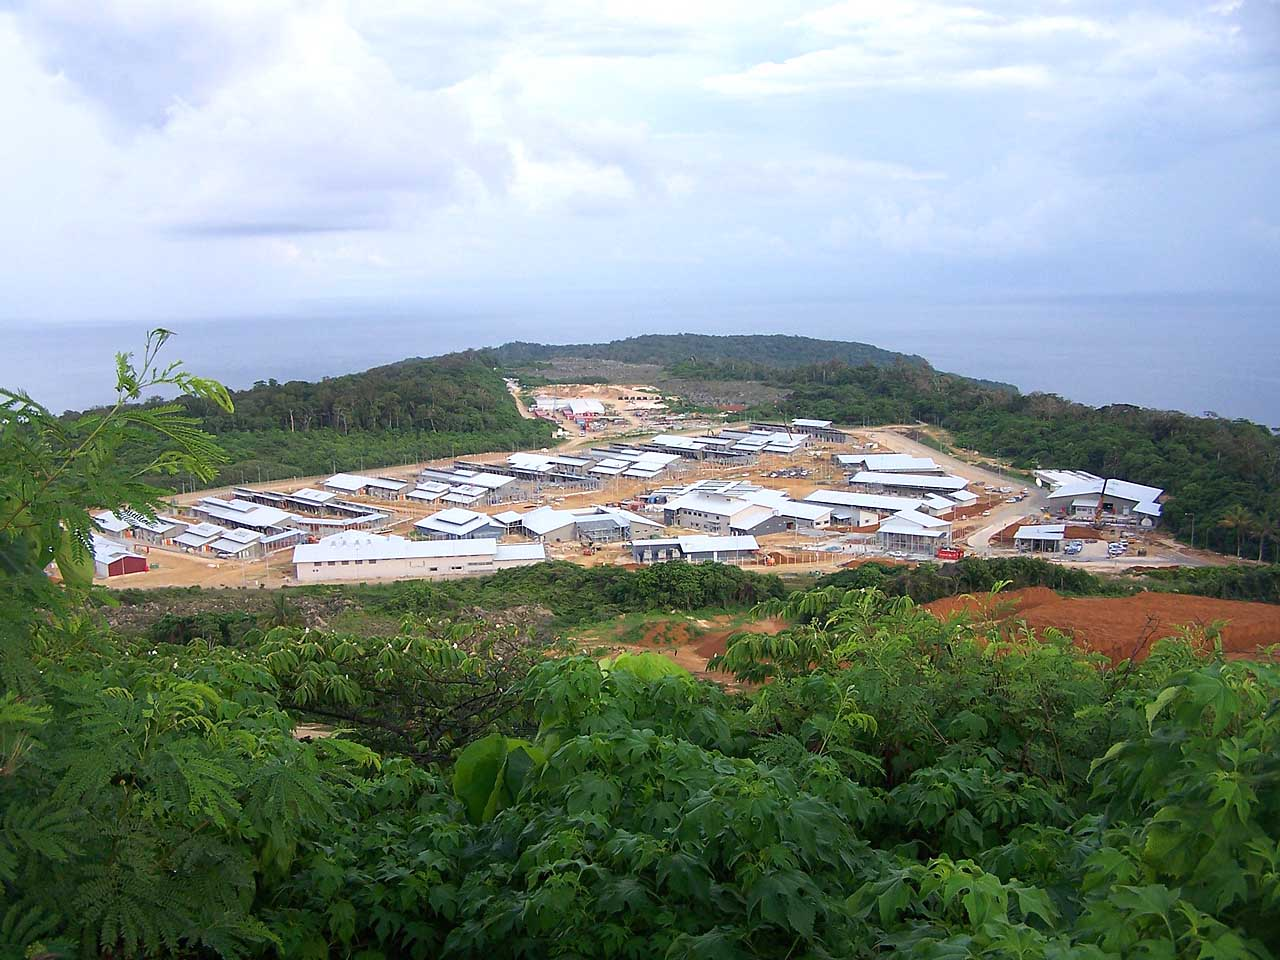 Alcatraz Down Under: the Guantanamo Bay detention centre of Christmas Island